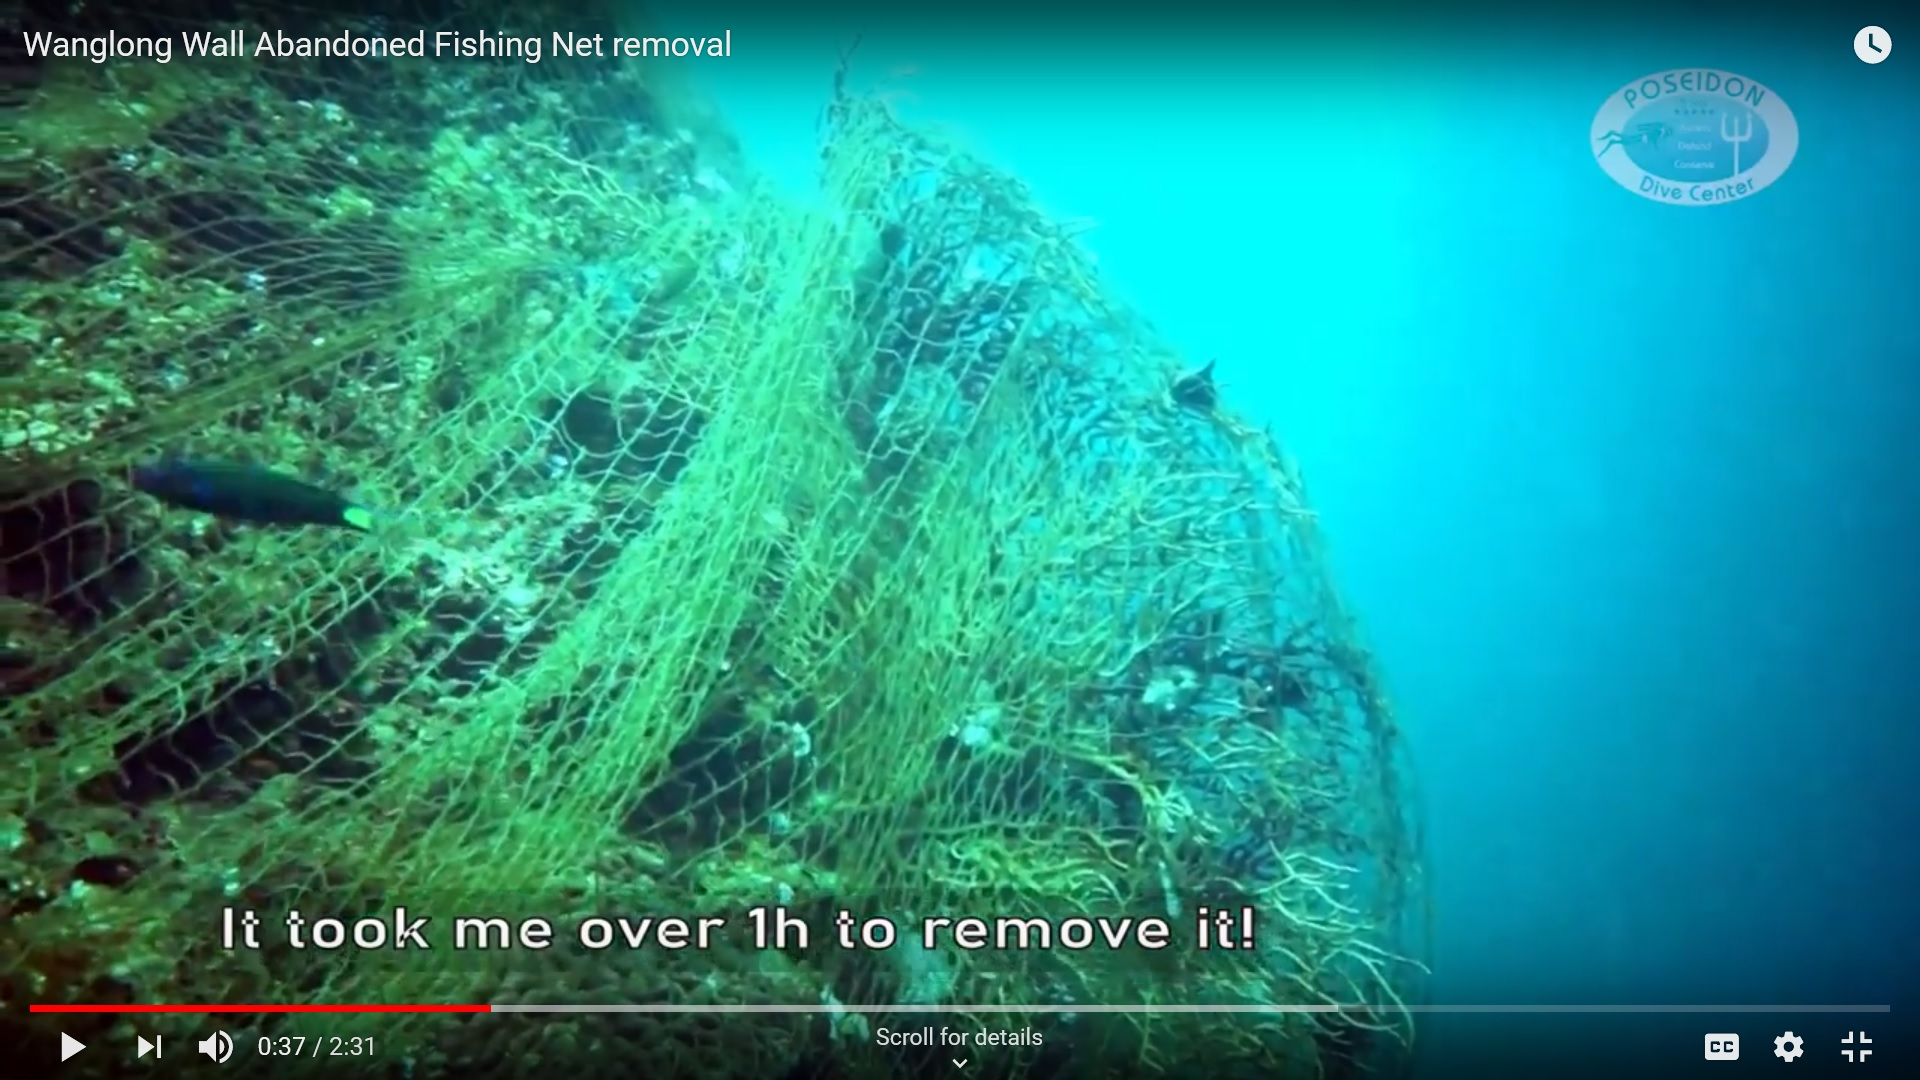 Wanglong Wall abandoned fishing net